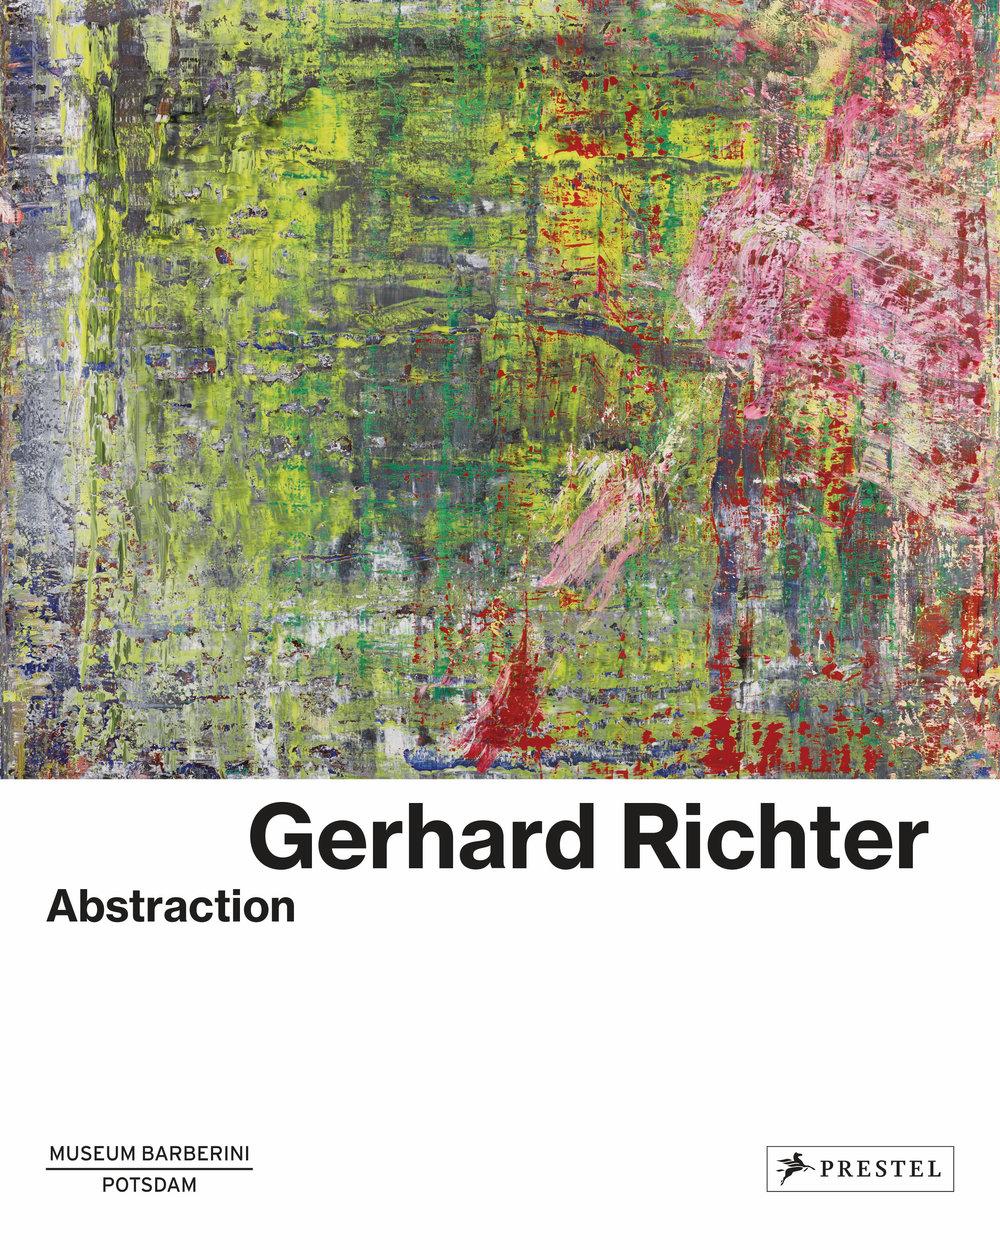 Museum Barberini,  Gerhard Richter: Abstraction , Random House, 2018   Editing